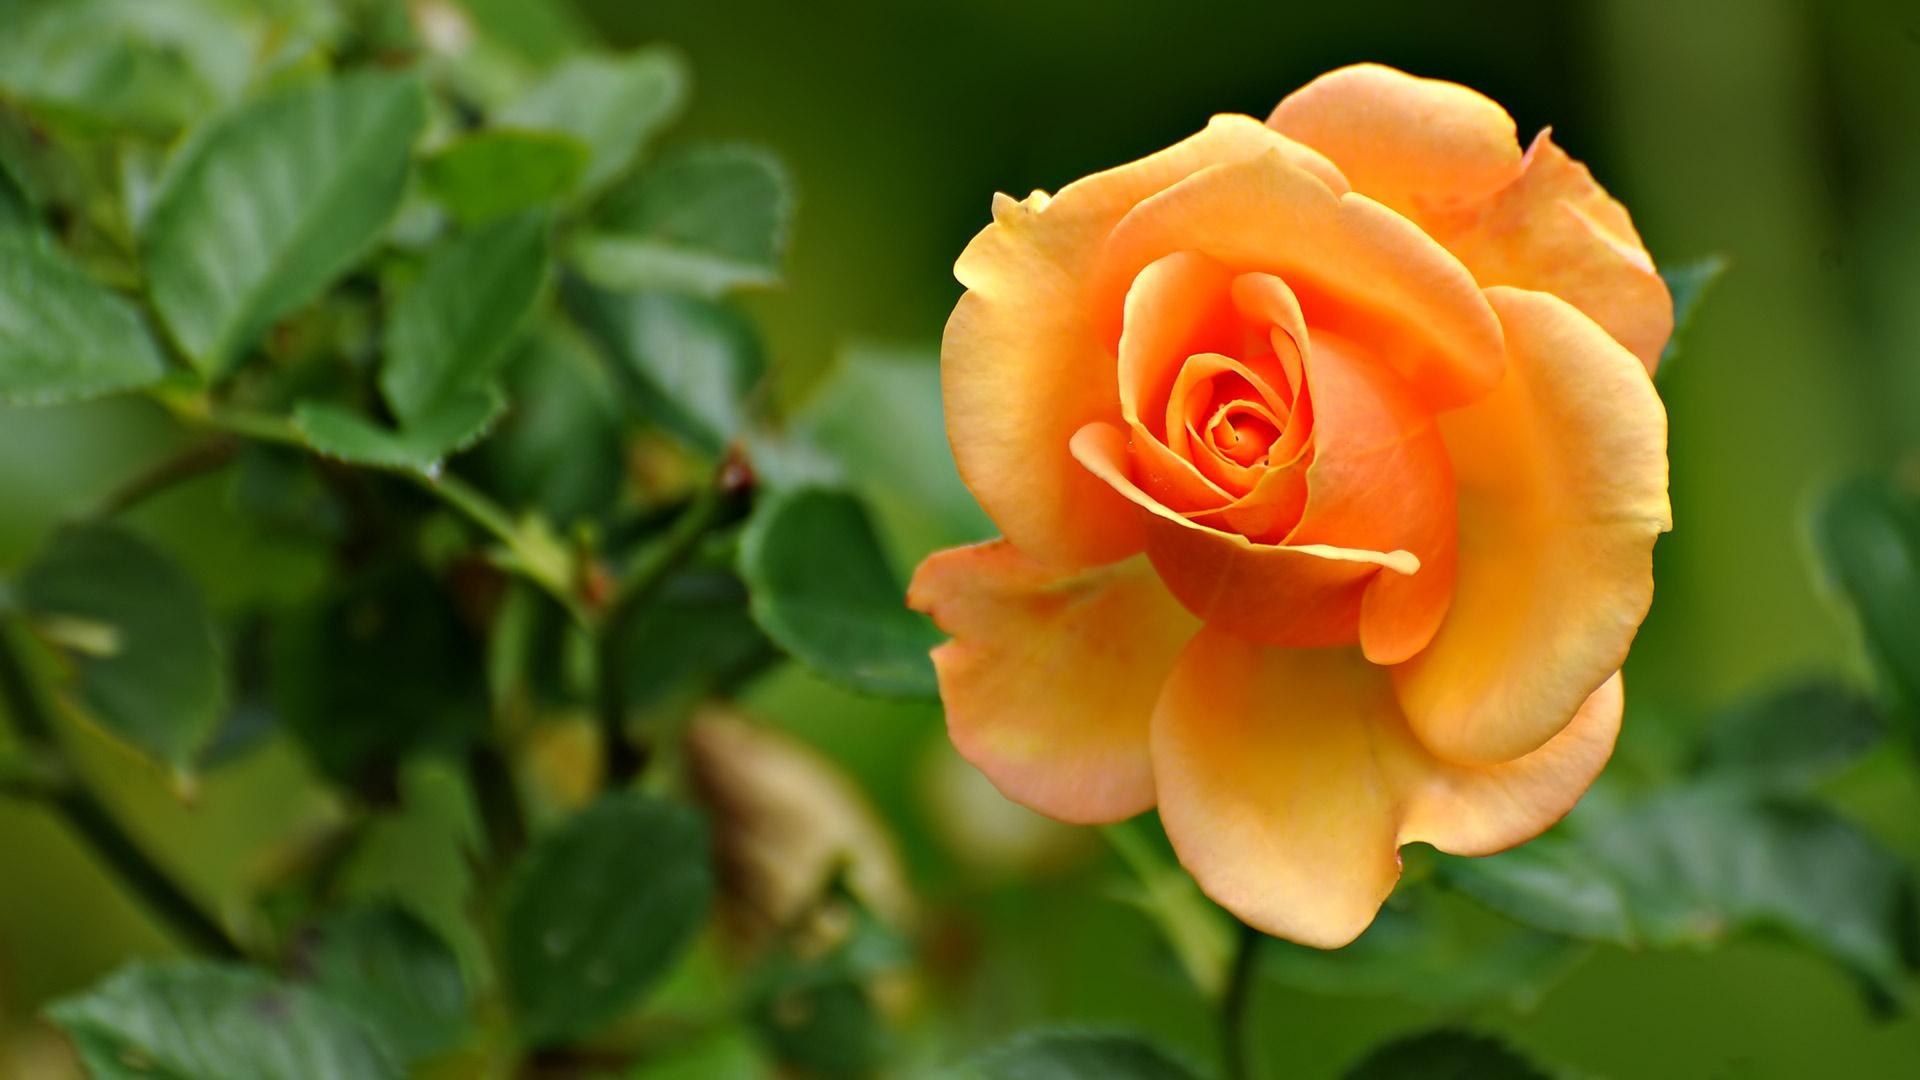 Roses auntie dogma 39 s garden spot - Rose desktop wallpaper hd ...